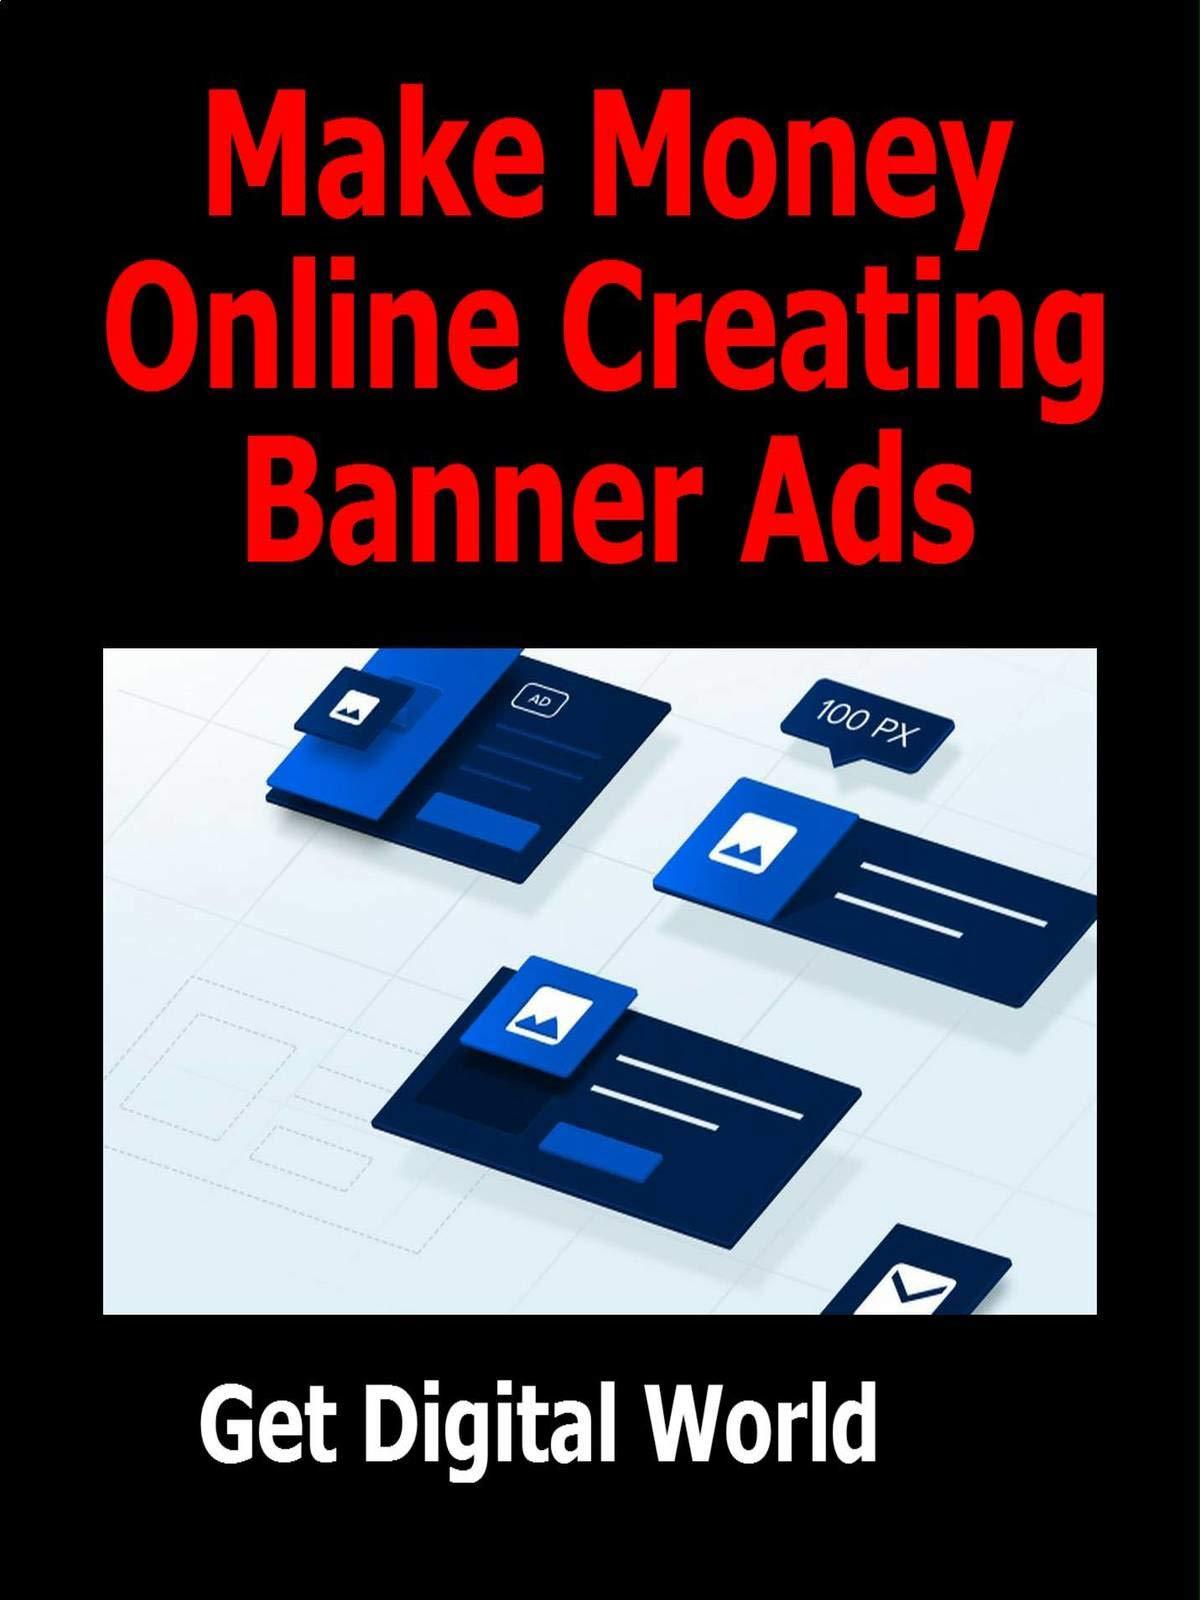 Make Money Online Creating Banner Ads